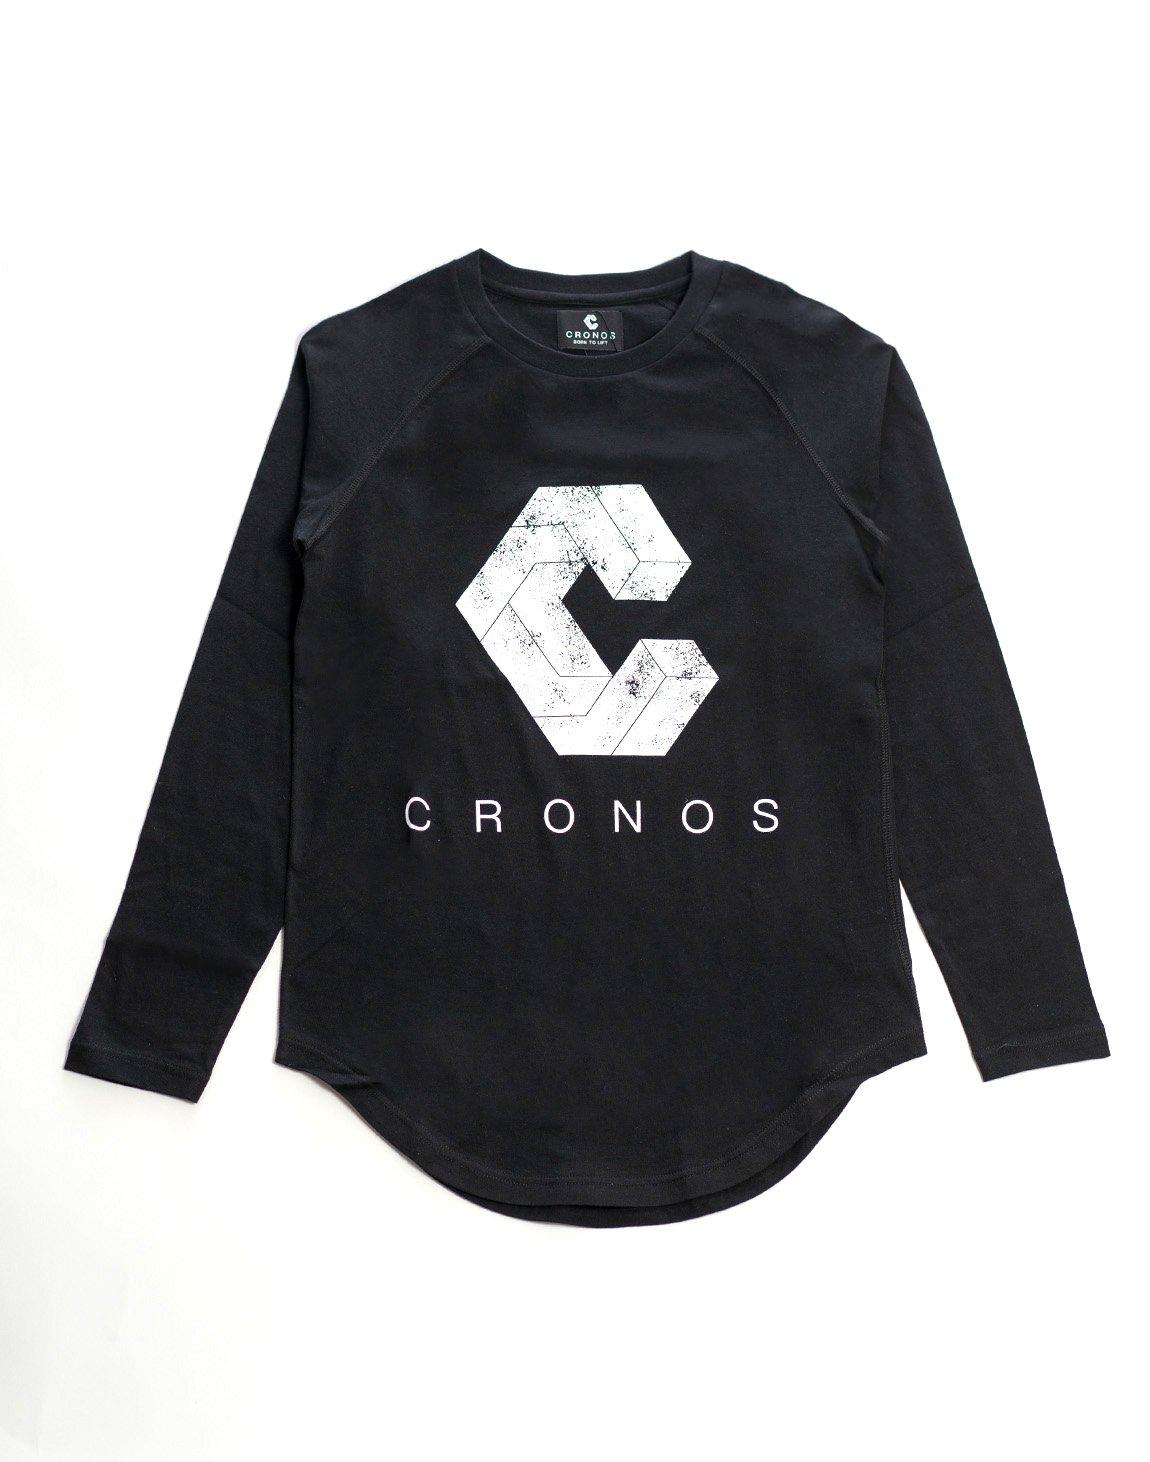 CRONOS CLASSIC LOG LONGSLEEVE  BLACK